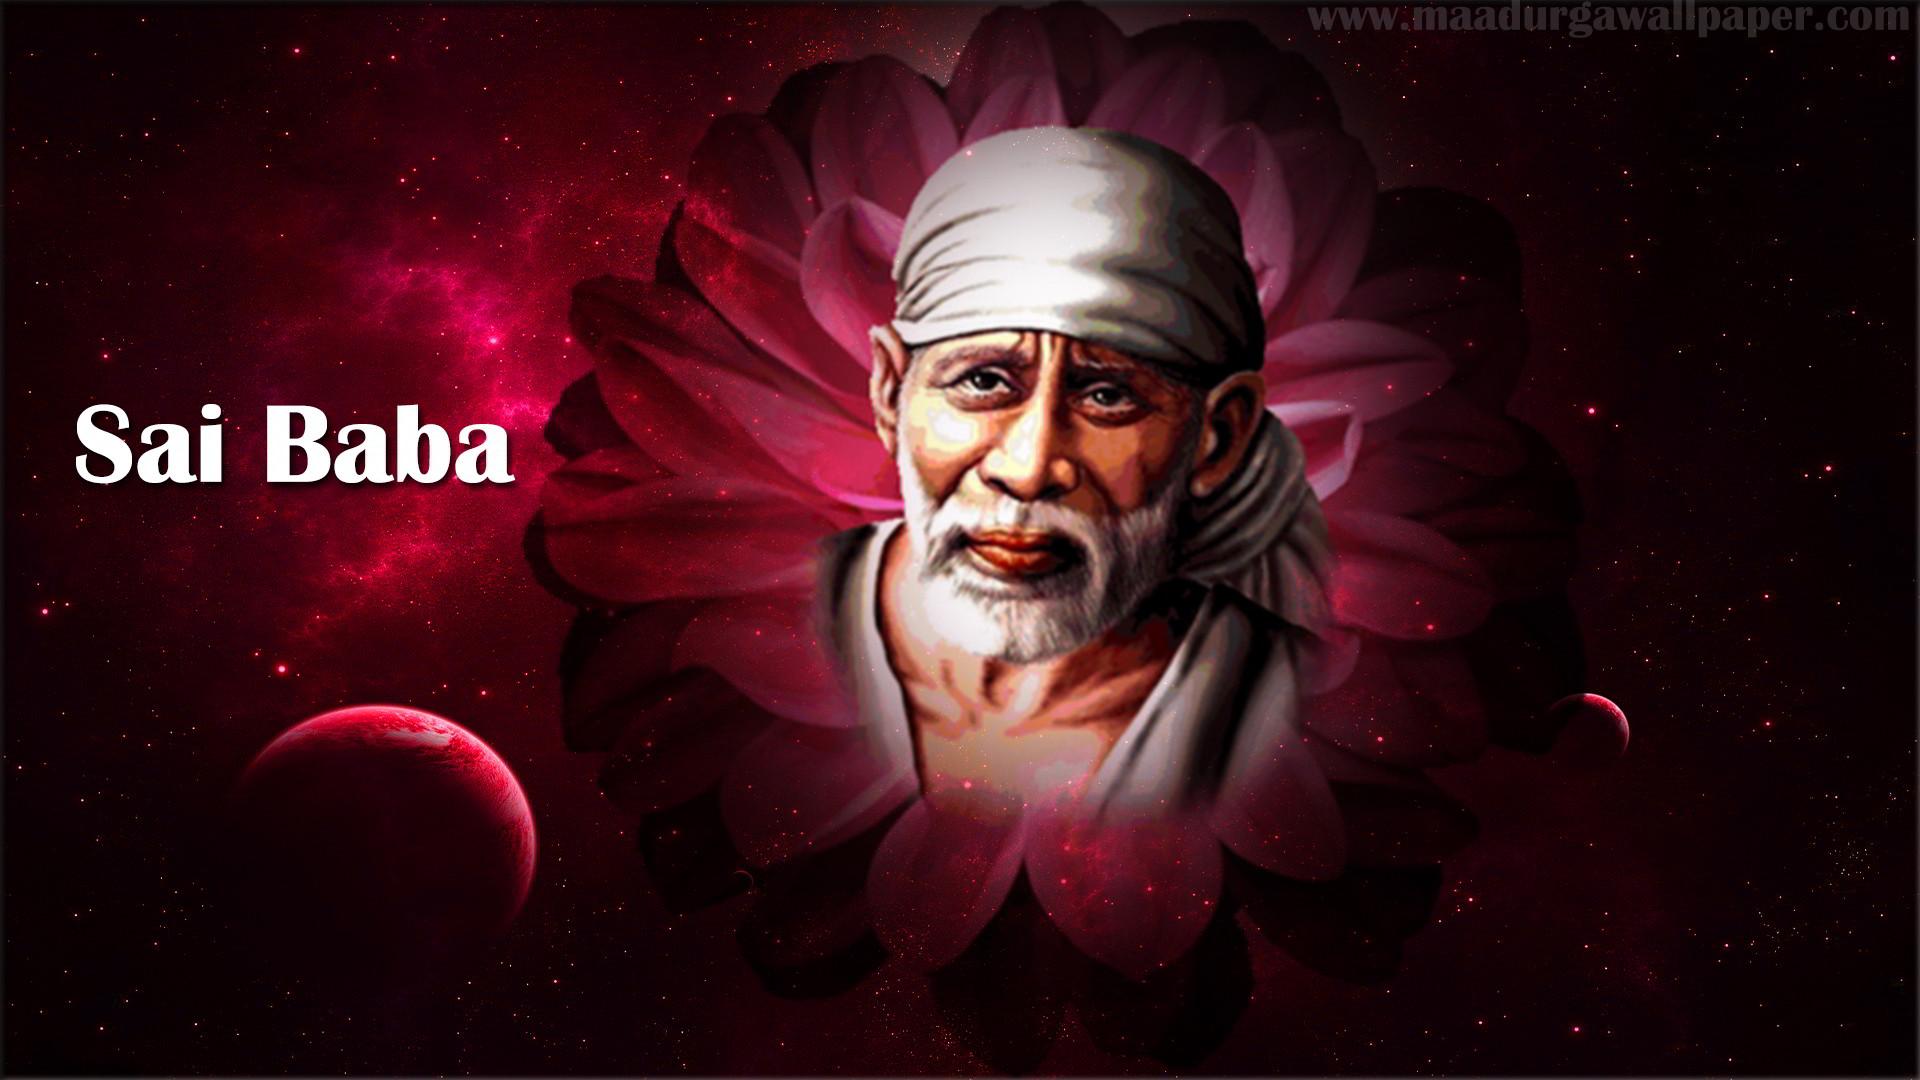 Sai Baba Hd 3d Wallpaper Download Hindu God Shirdi Saibaba Hd Wallpaper Sai Baba Hd